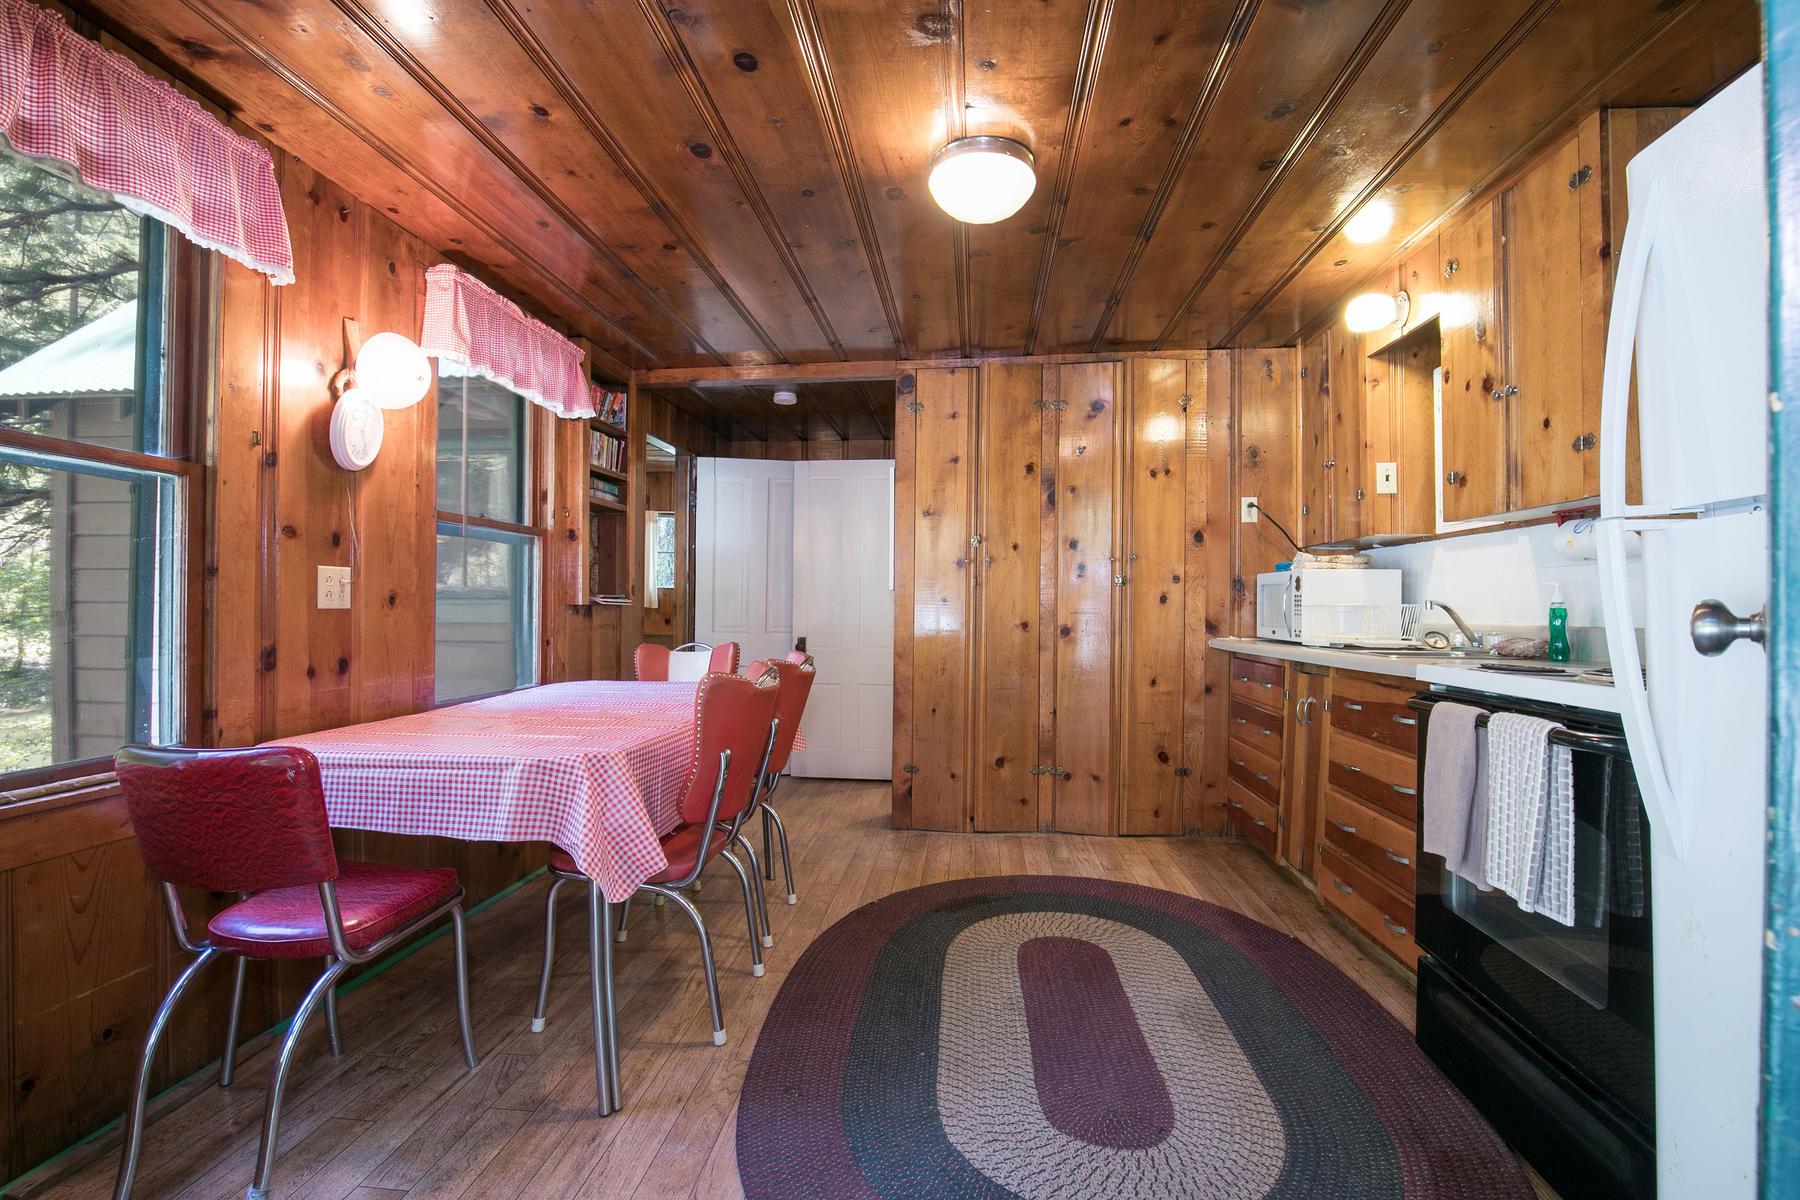 Additional photo for property listing at 21622-2162 Highway 49, Sierra City, California 96125 21622-2162 Highway Sierra City, 加利福尼亚州 96125 美国